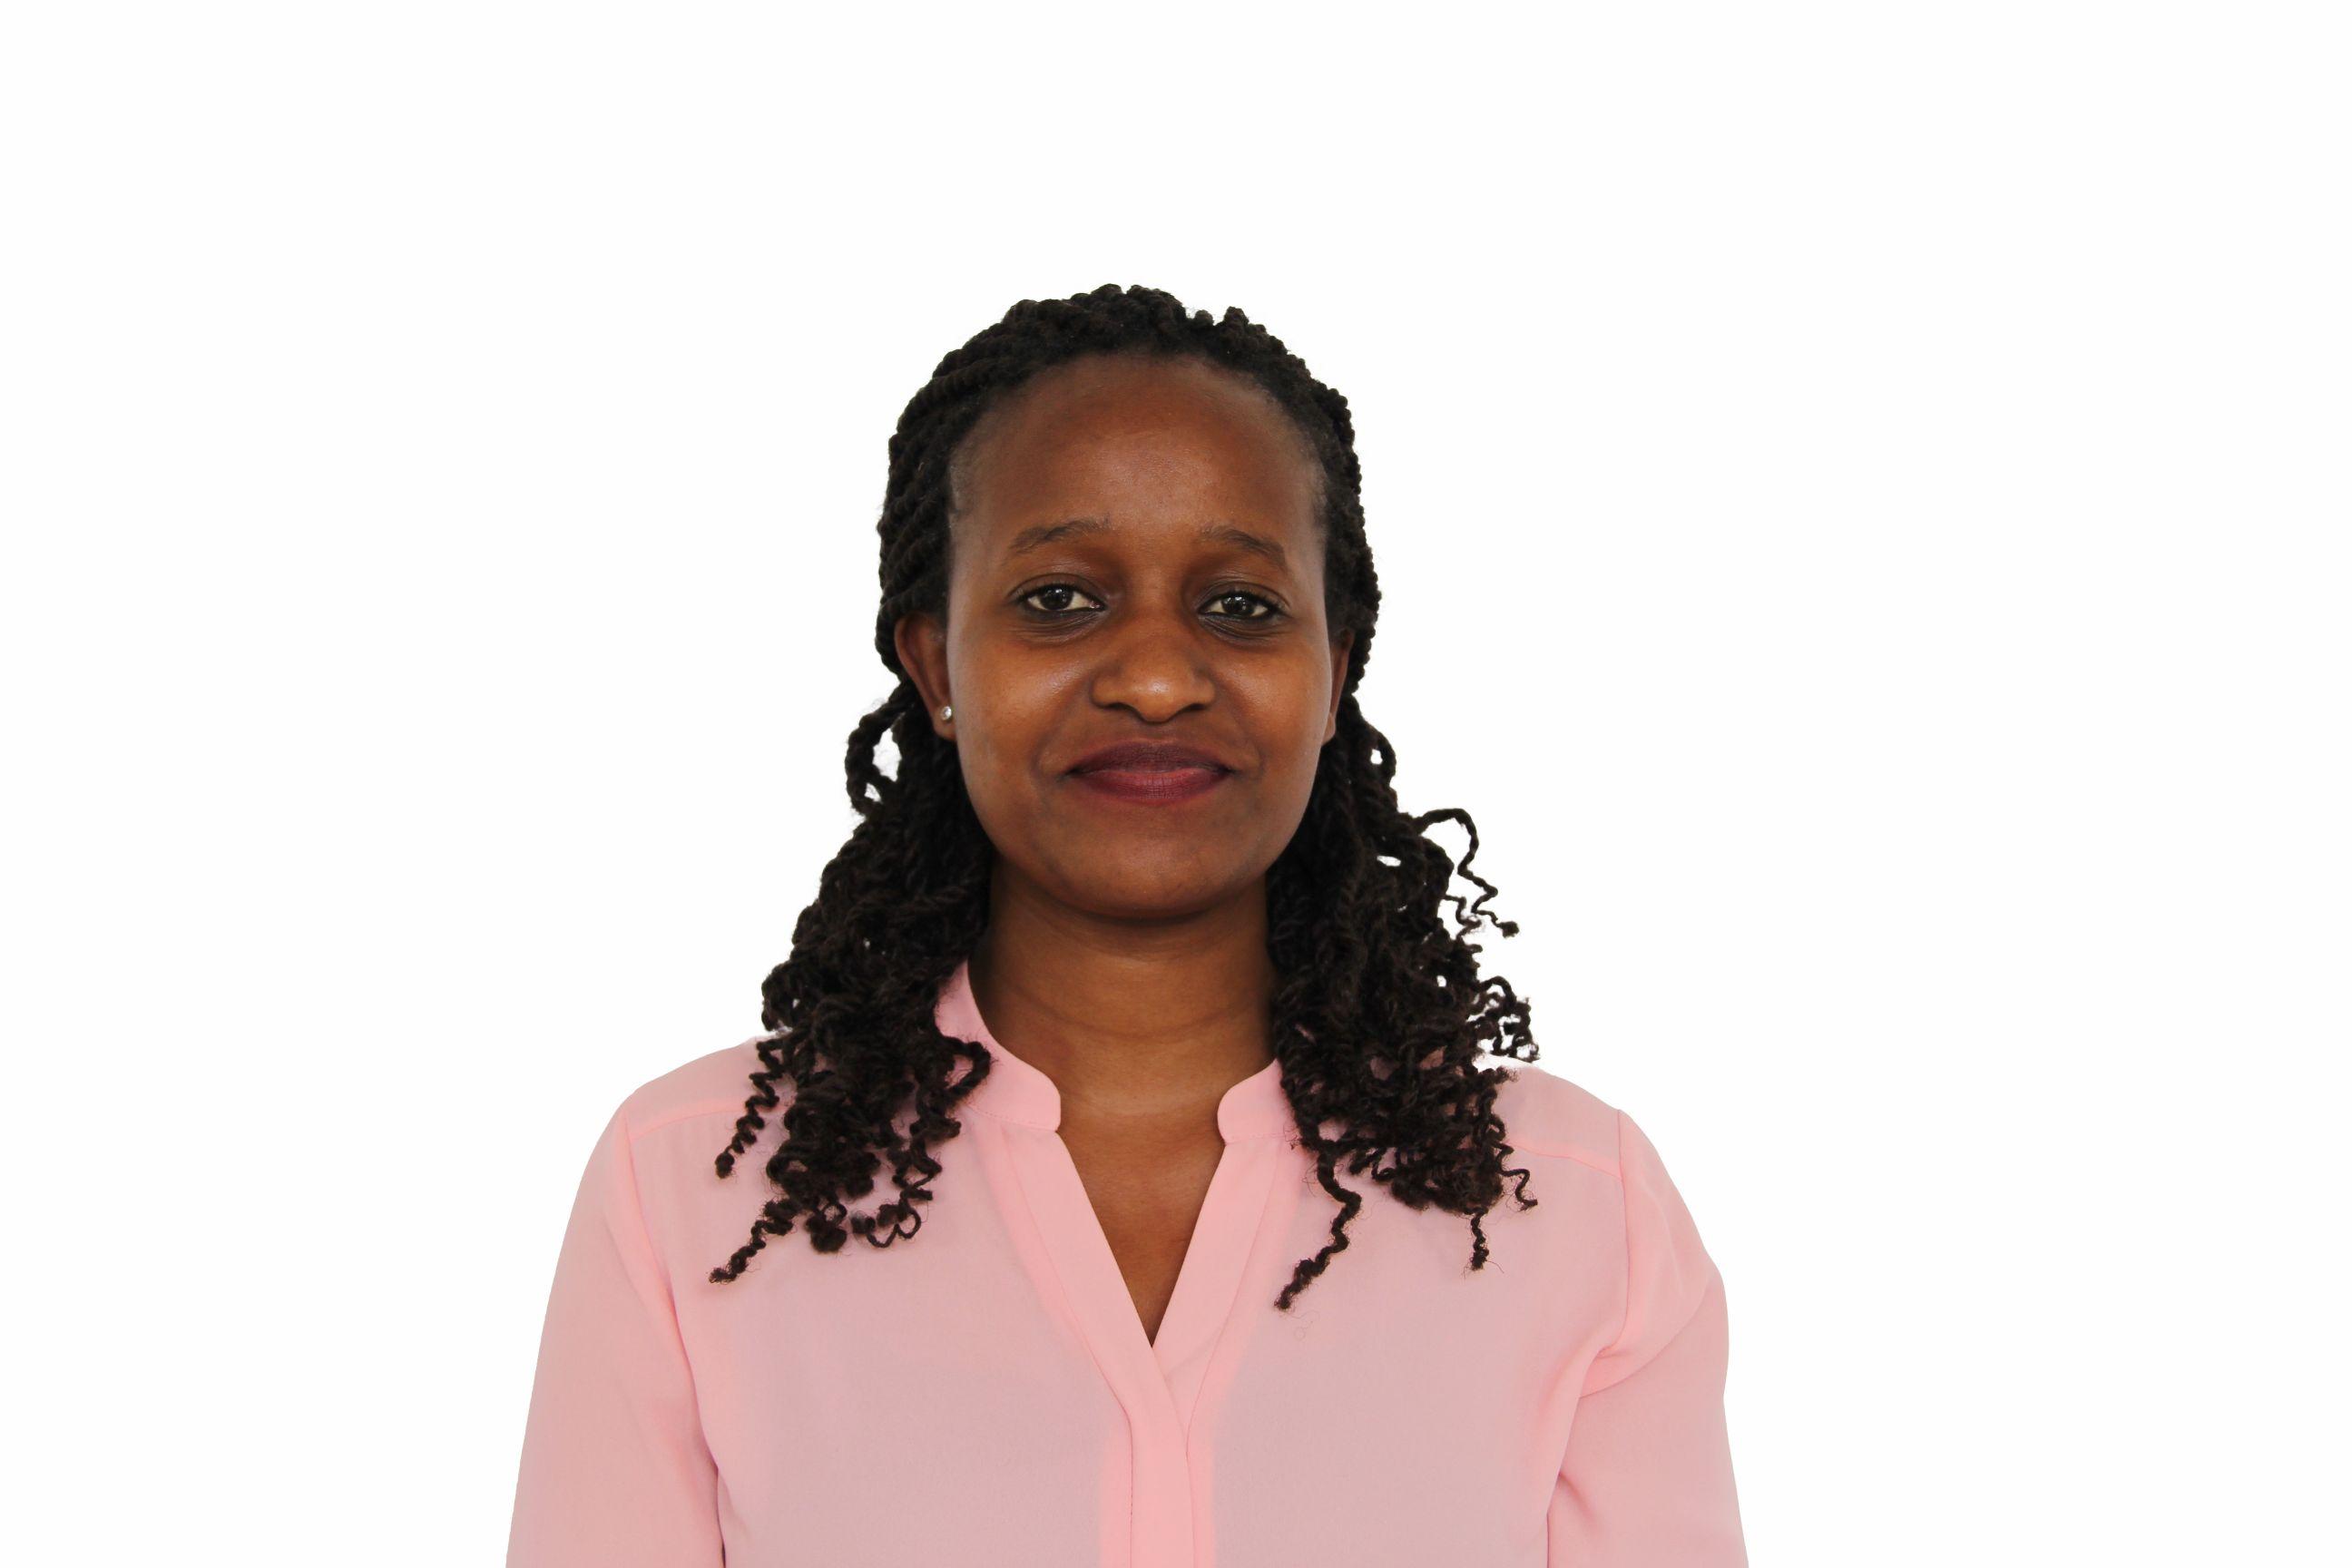 Ms. Charity Musyoka